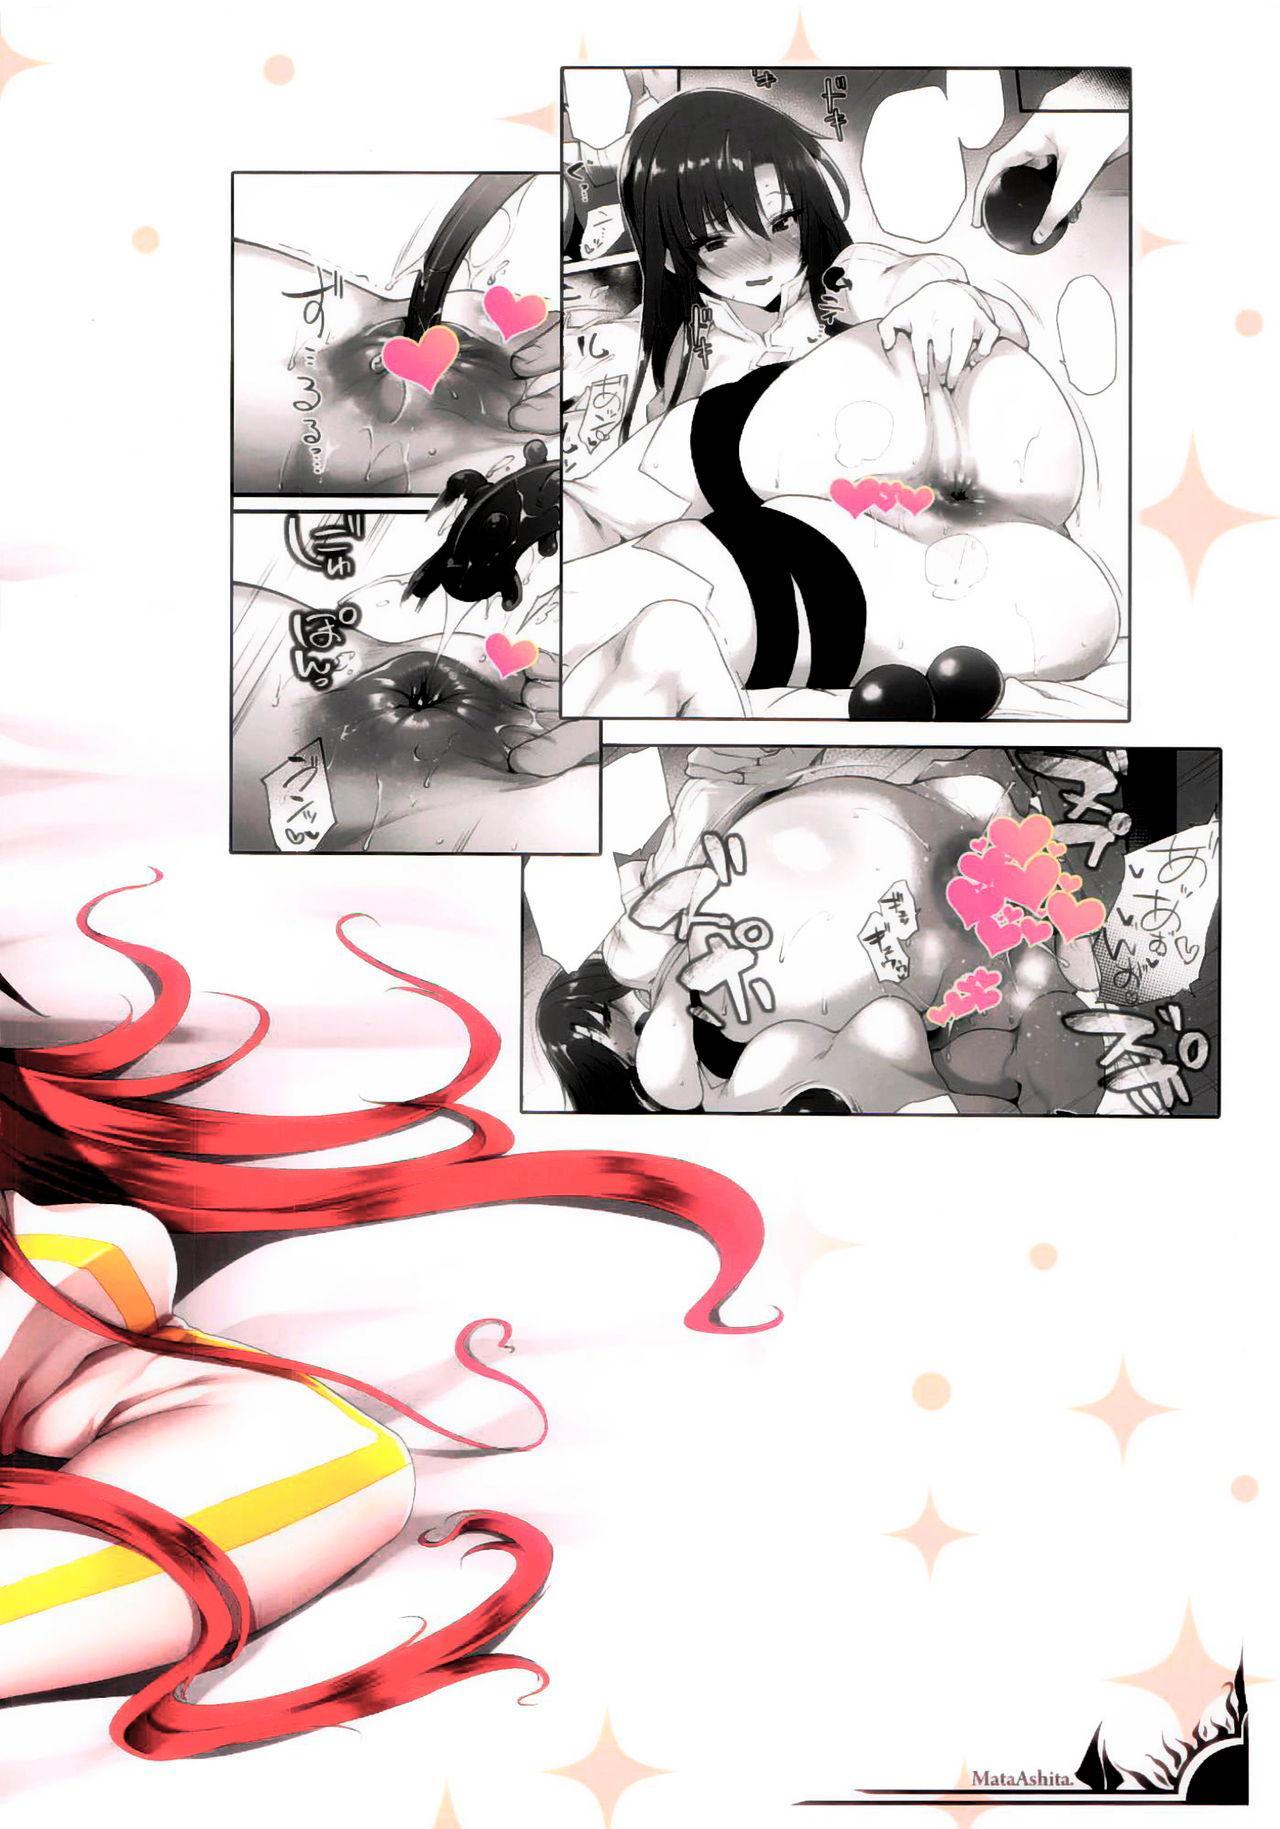 [Mata Ashita. (Oohira Sunset)] Boudica-san to Gom. -Anal Hen- | Boudica-san and Gom. -Anal Edition- (Fate/Grand Order) [English] [Hellsin] [2019-09-22] 25